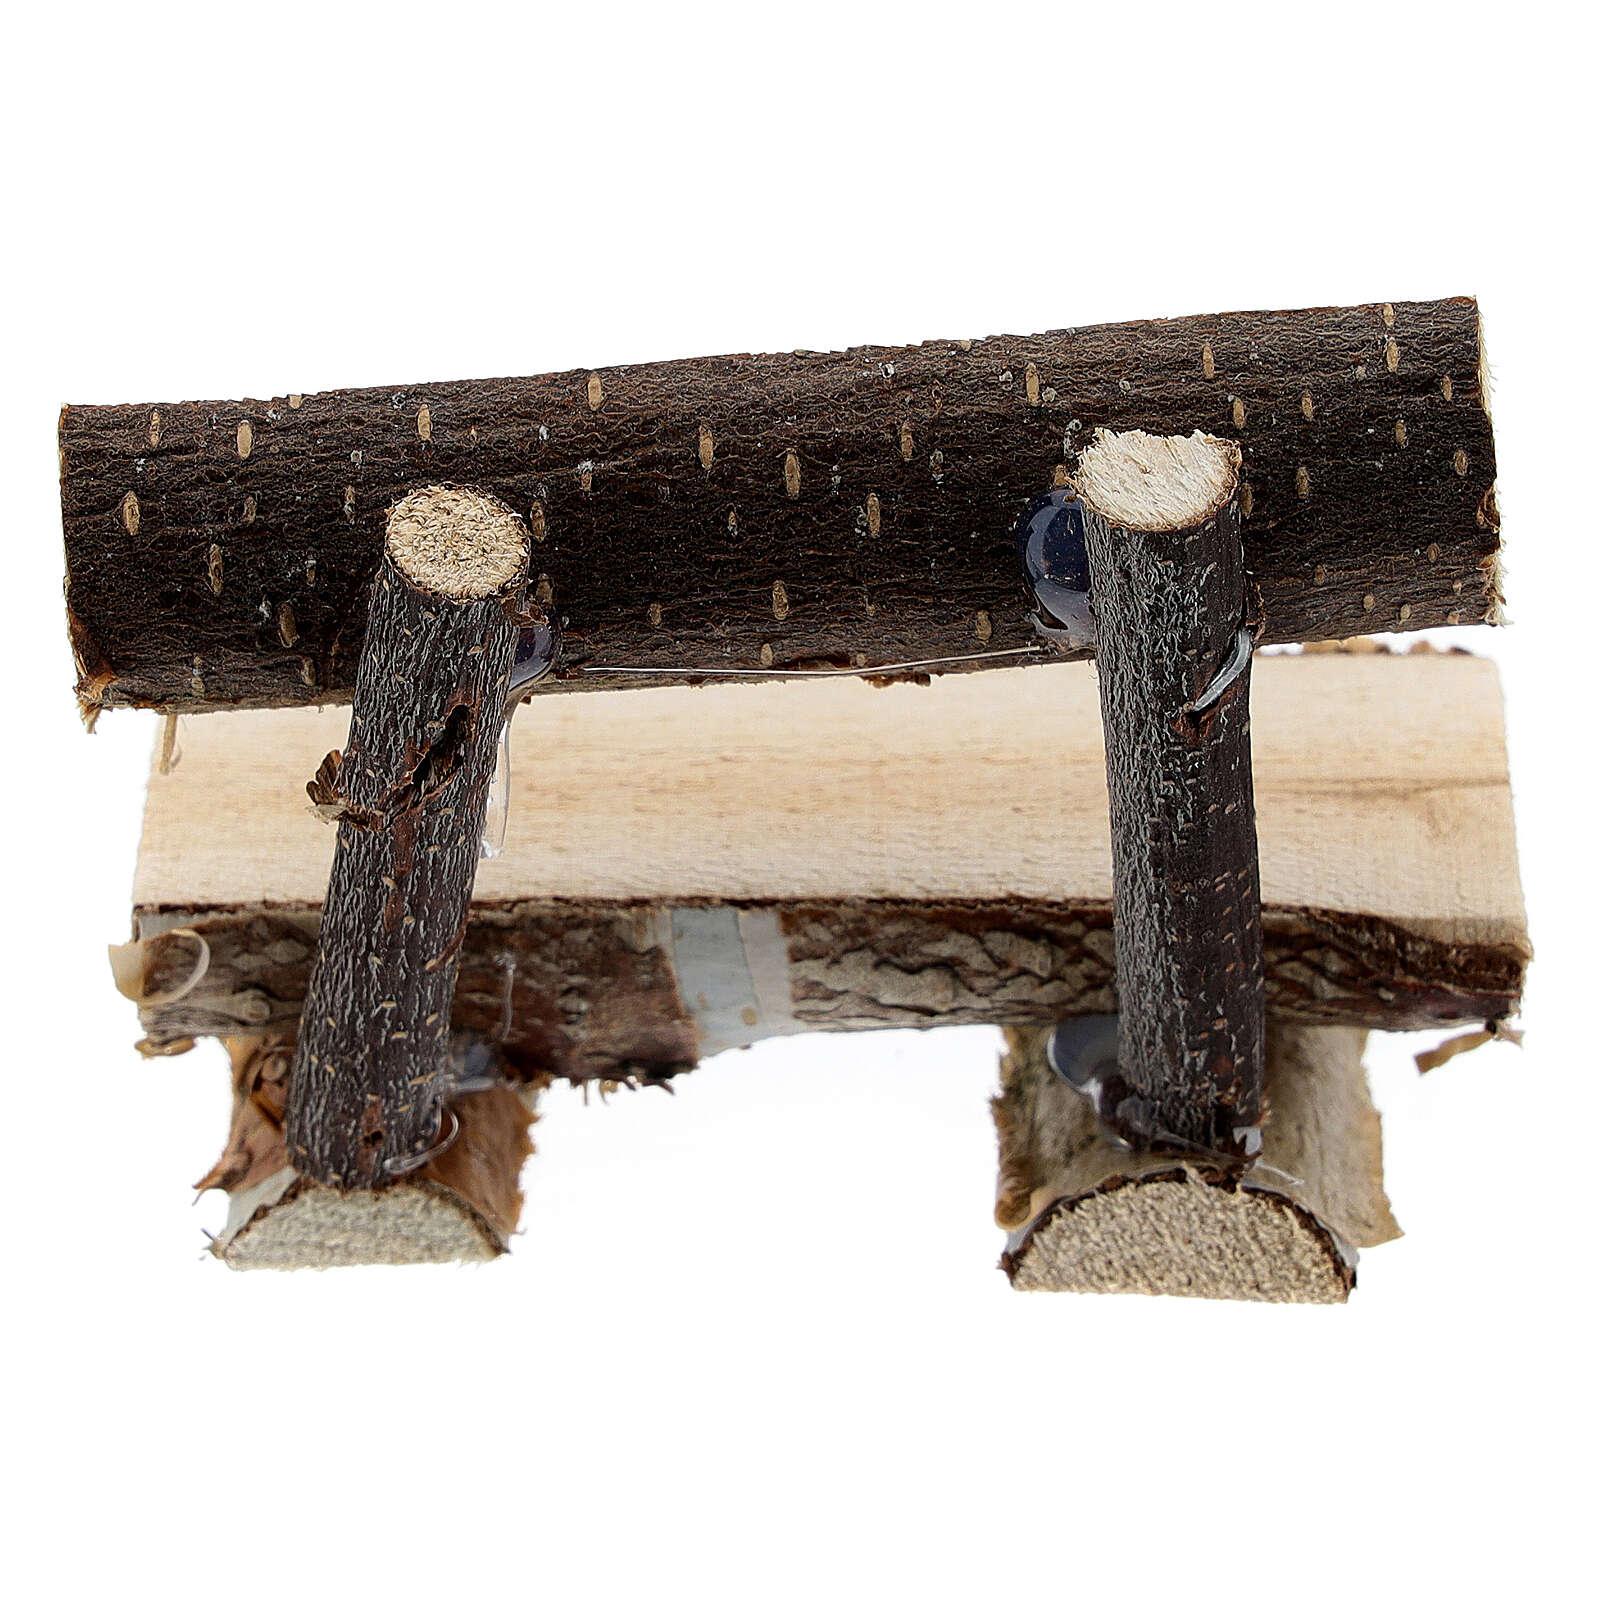 Panchina tronco albero presepe 8 cm 4